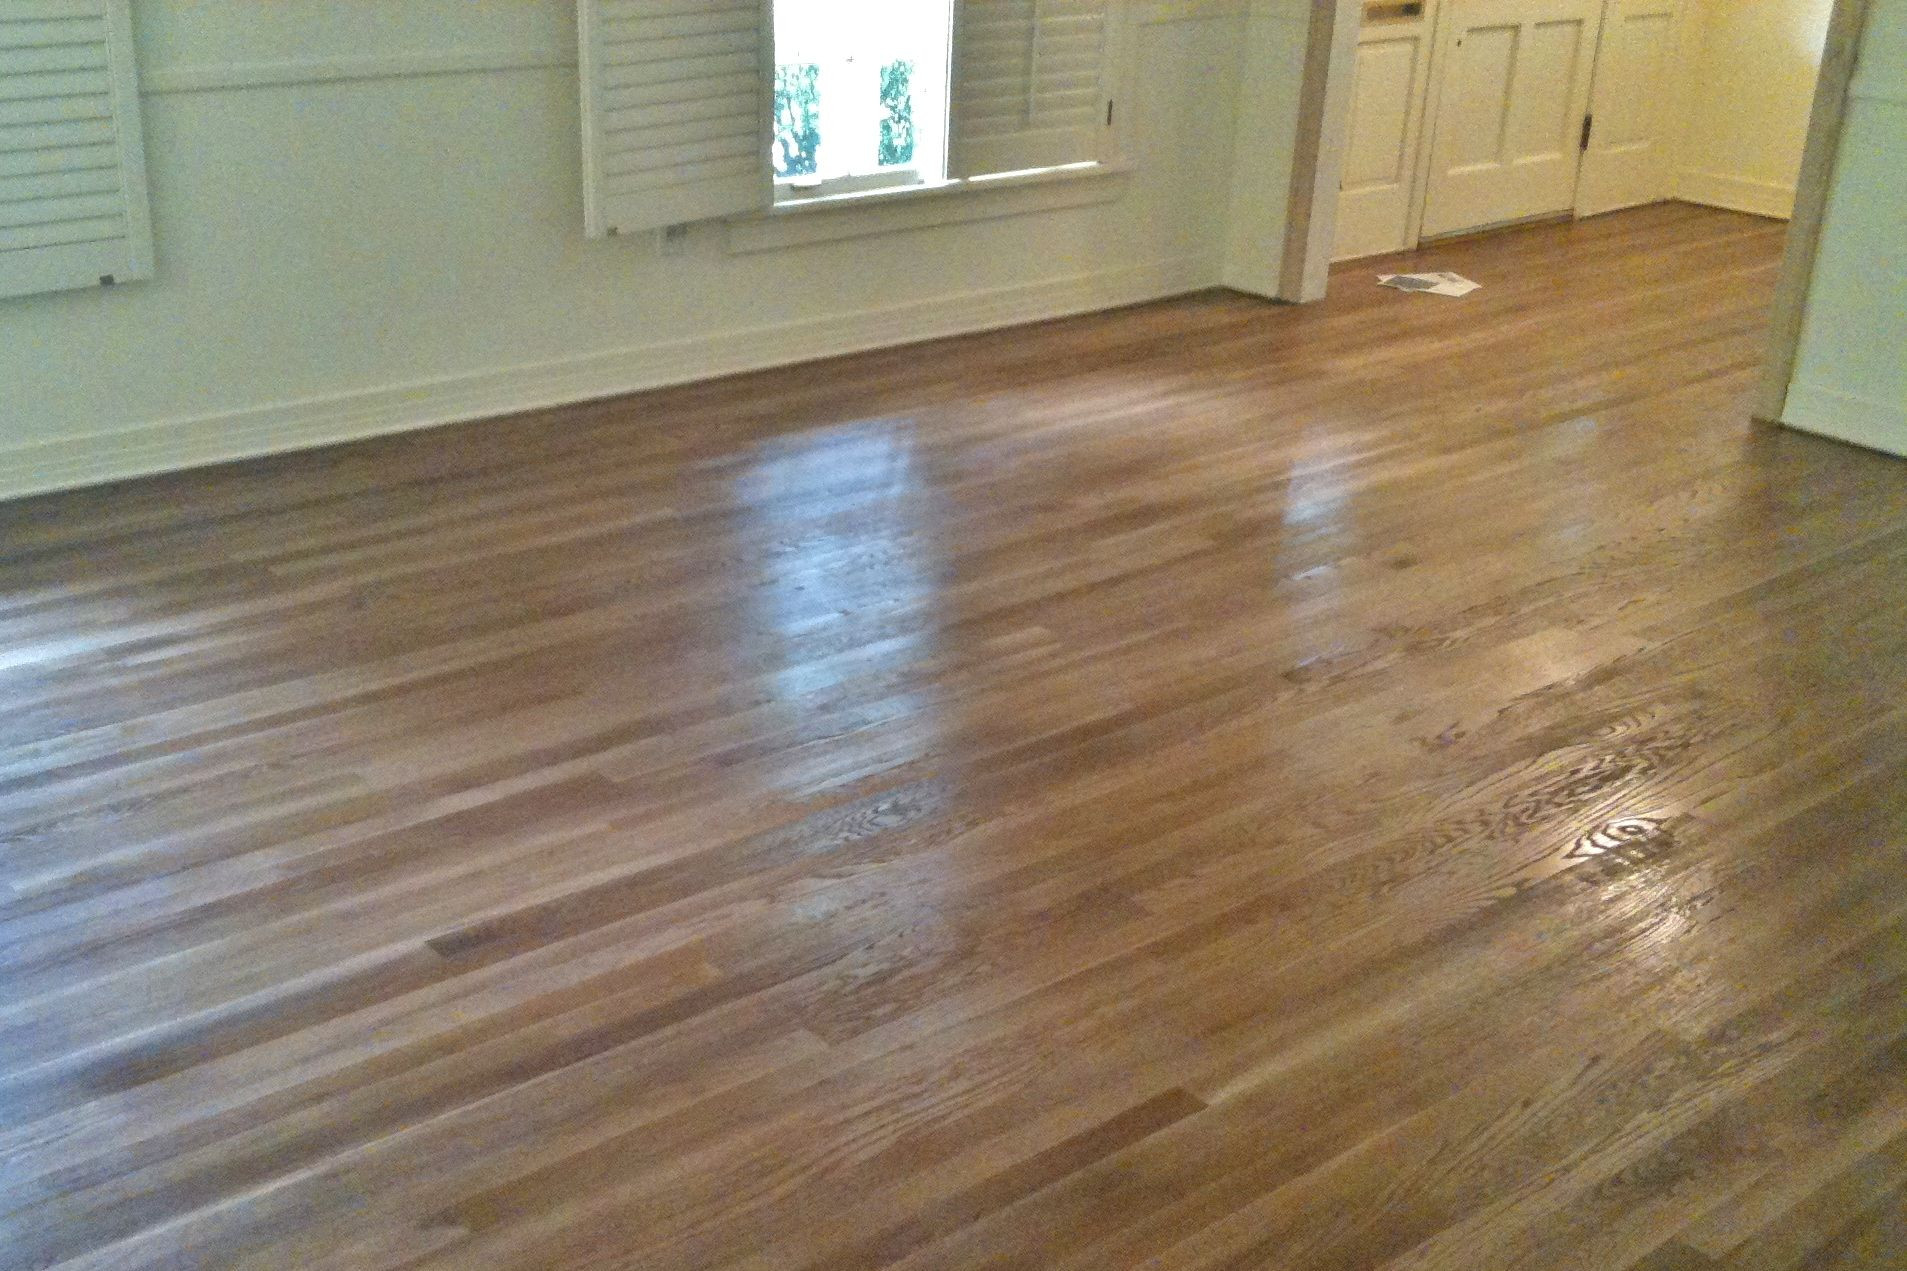 refinishing hardwood floors in sections of oak meet special walnut home design pinterest flooring with minwax special walnut stain on oak hardwood floors